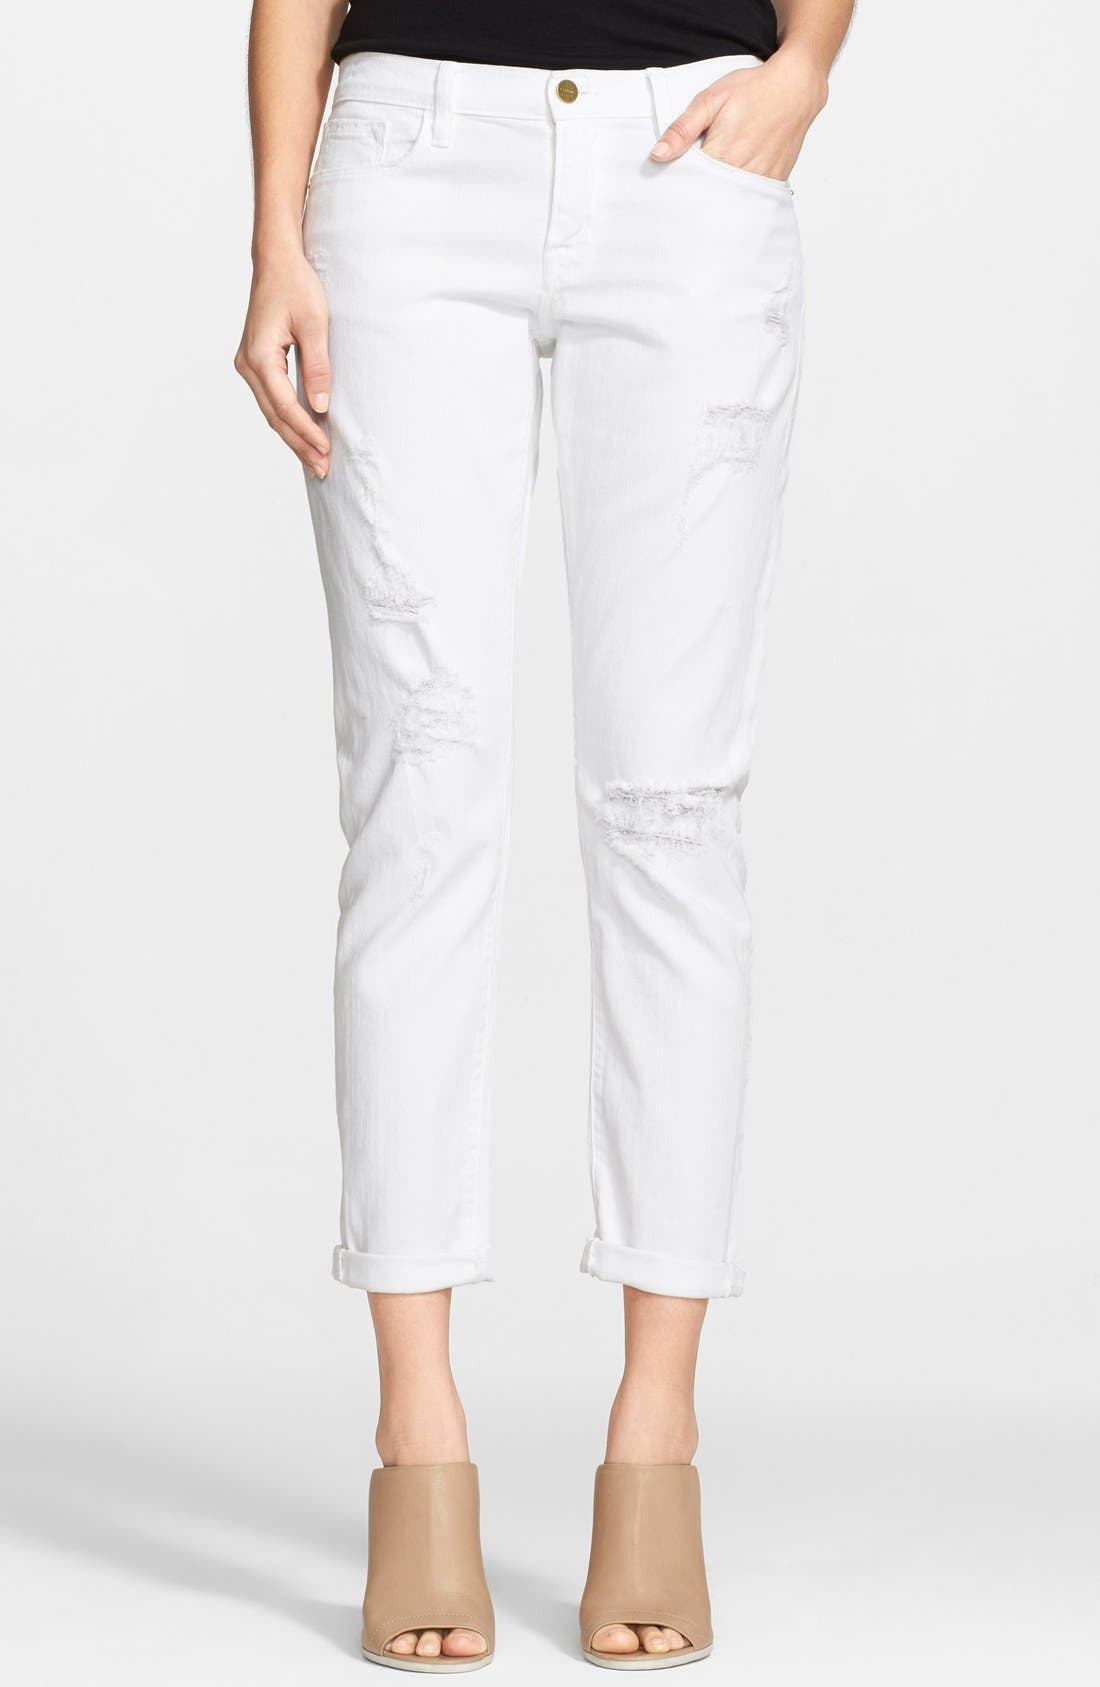 Alternate Image 1 Selected - Frame Denim 'Le Garcon' Destroyed Slim Boyfriend Jeans (Rip Blanc)